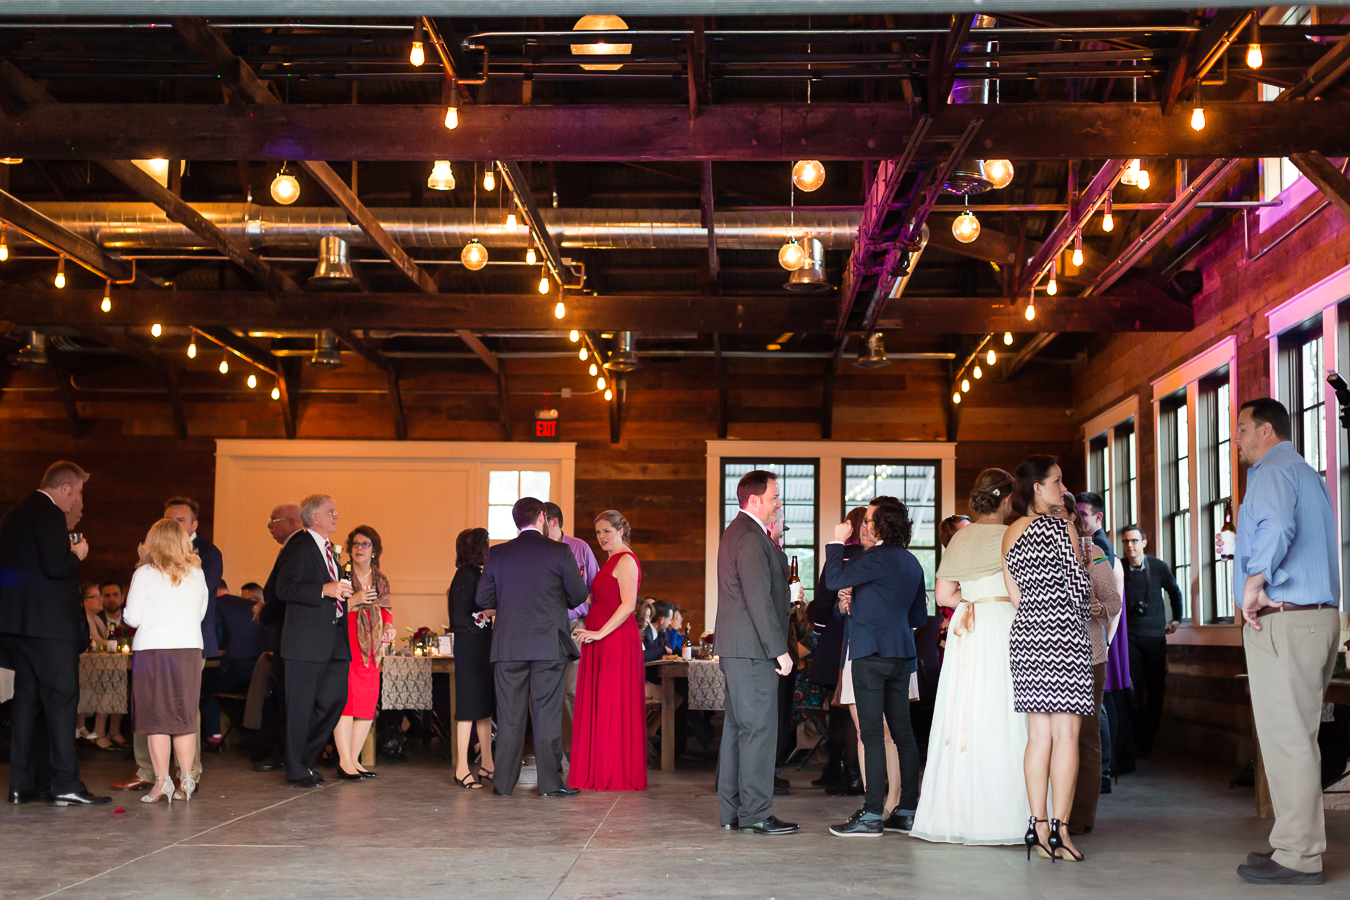 union-on-eighth-wedding-photographs-015.jpg